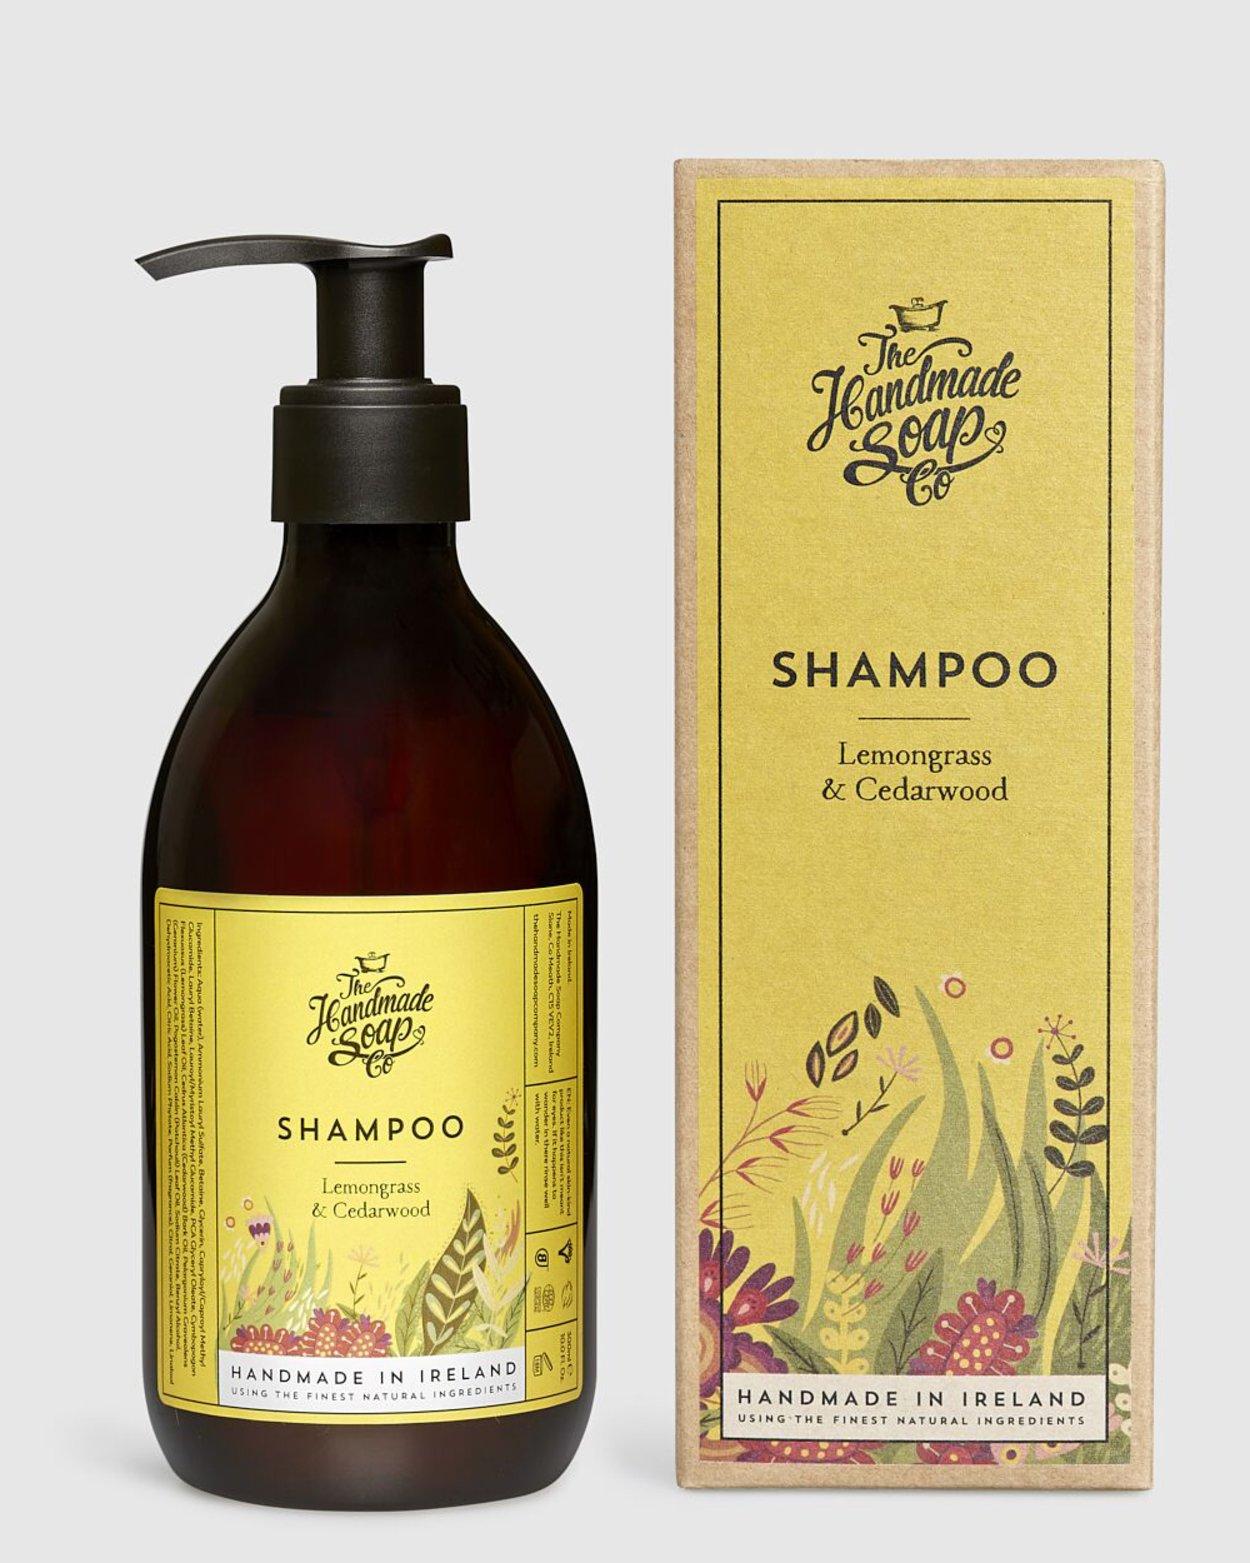 Lemongrass & Cedarwood Shampoo